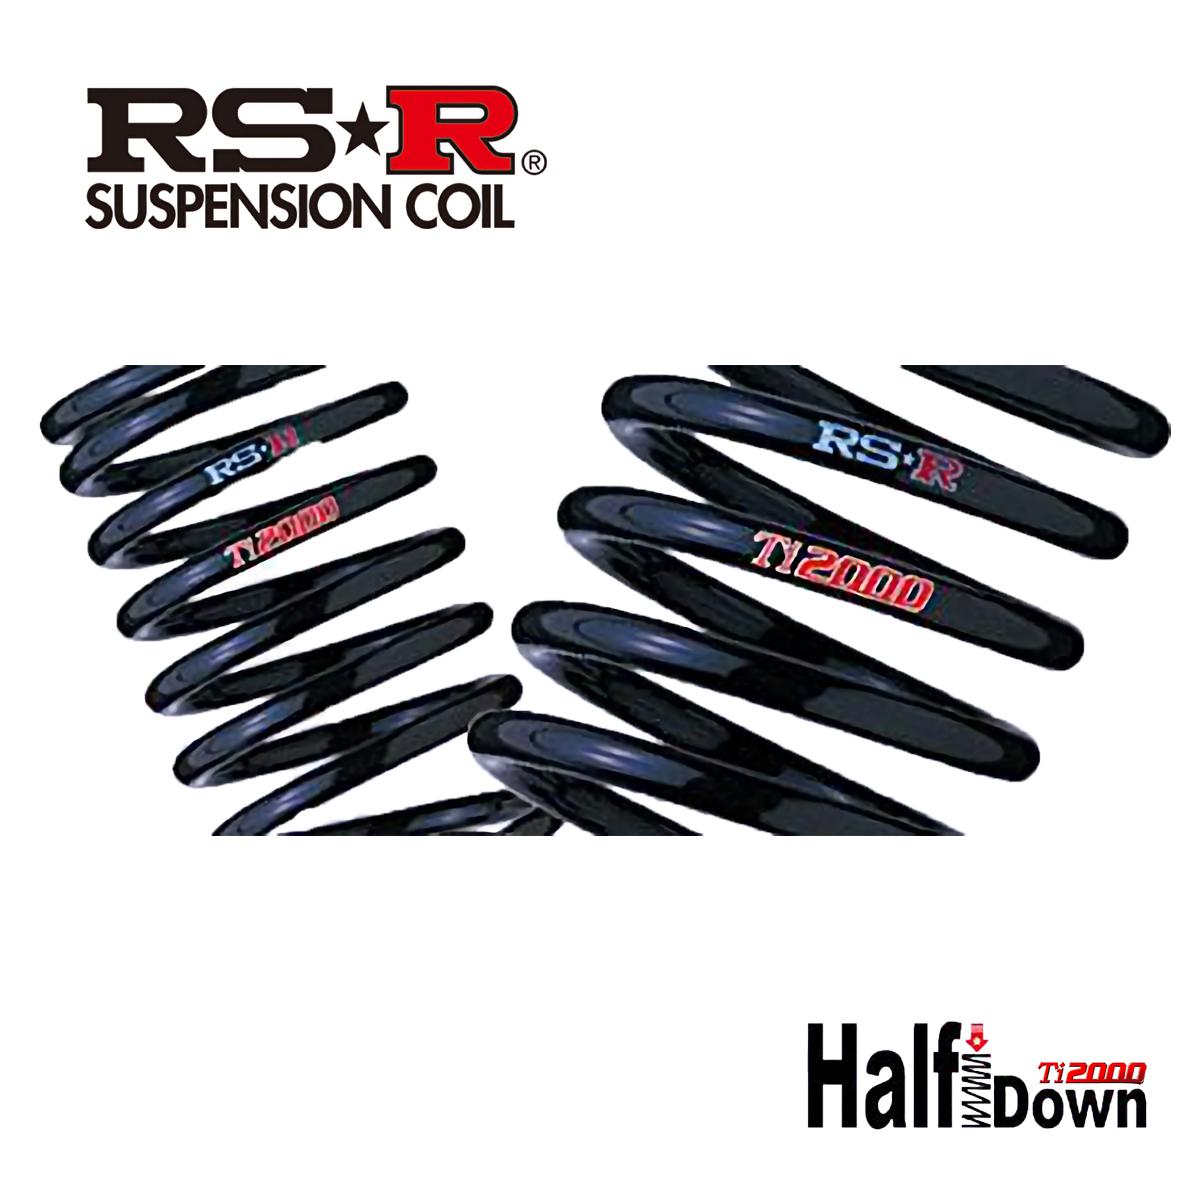 RS-R セール開催中最短即日発送 タンク M900A ダウンサス スプリング フロント T513THDF Ti2000 RSR ハーフダウン 日時指定 個人宅発送追金有 DOWN カスタムG-T HALF